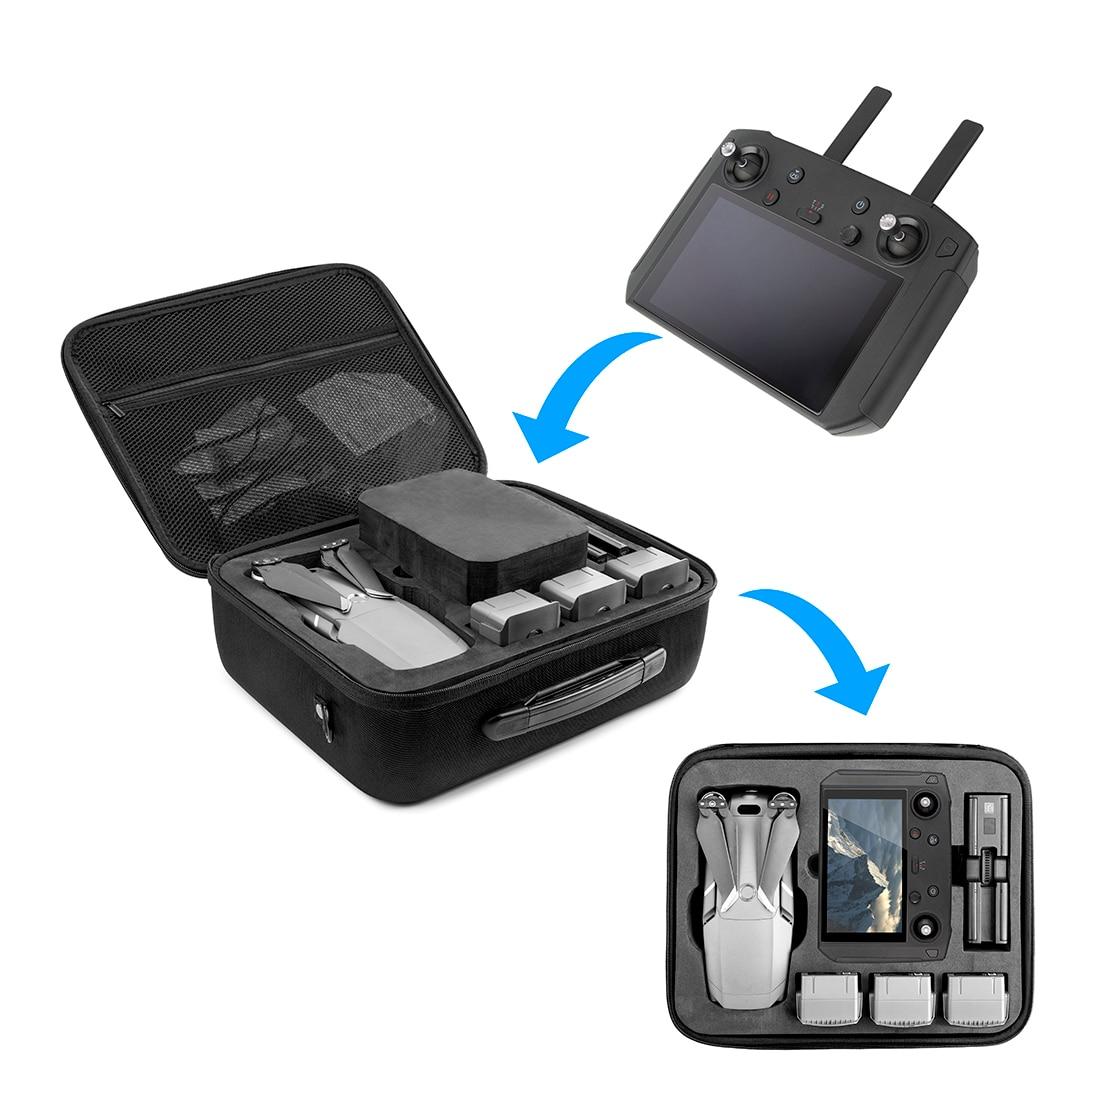 for Mavic 2 Pro /Zoom Drone Case Waterproof Battery Filter Charger Storage Bag Strap Handbag for DJI Mavic 2 Smart Controller